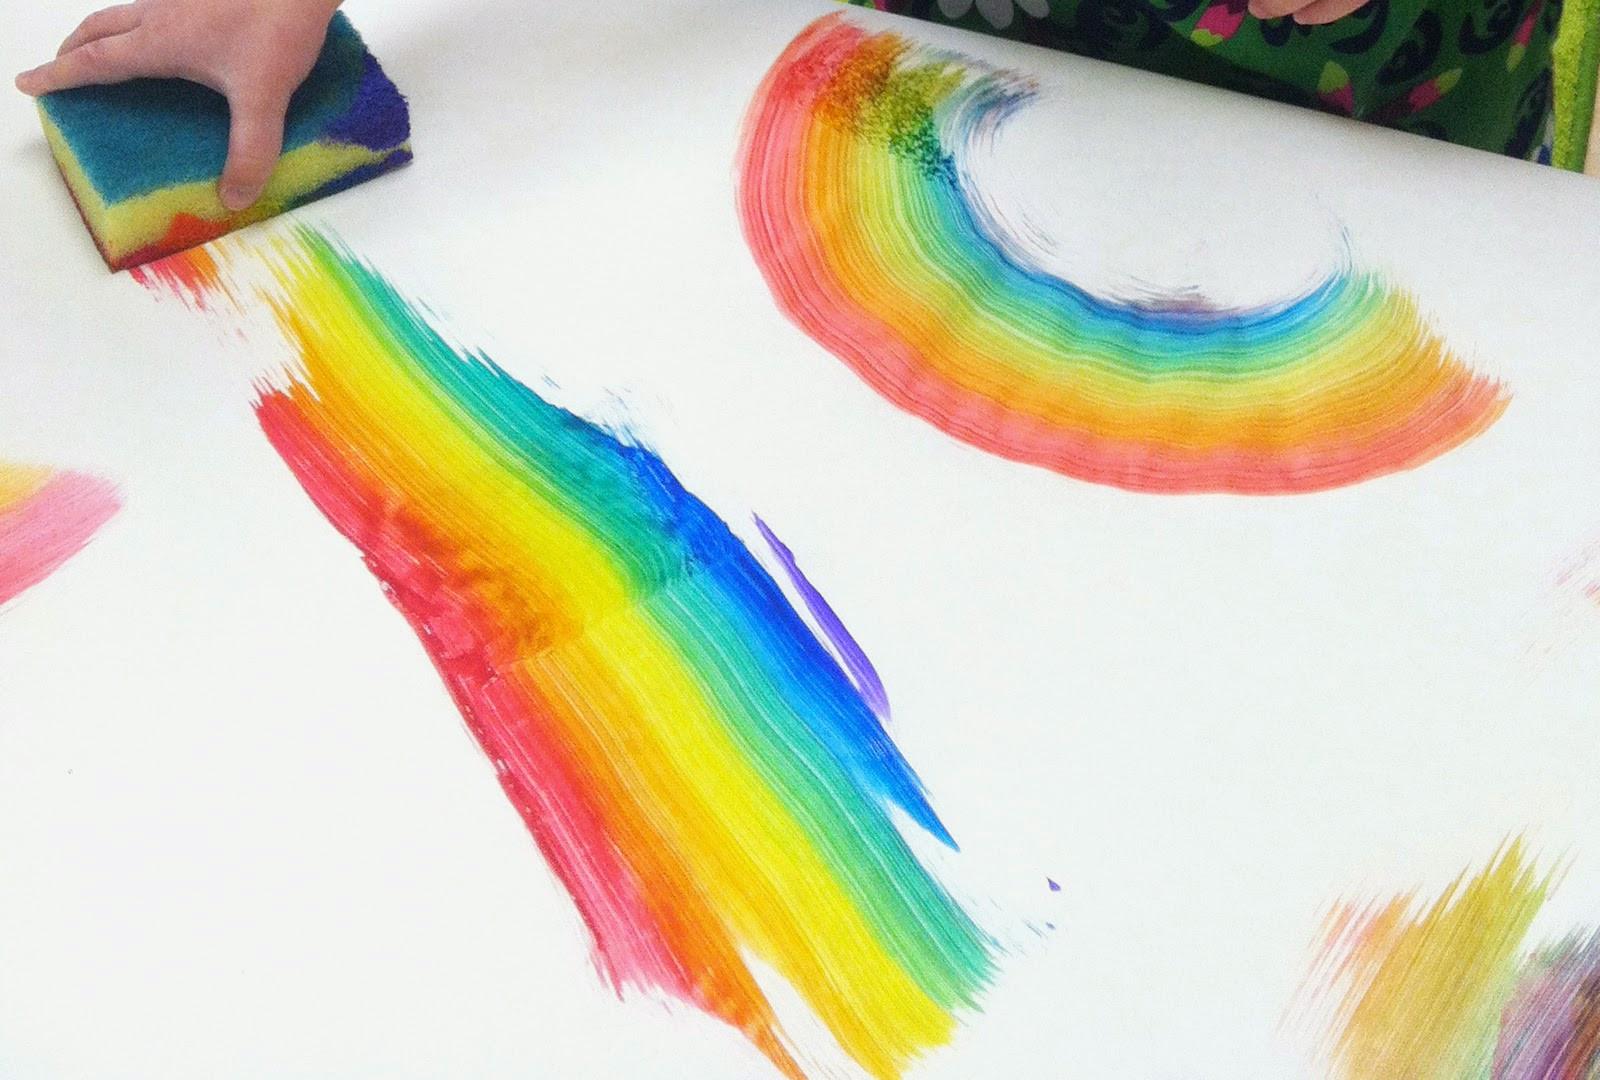 Rainbow Artwork For Preschoolers  Recycling Center